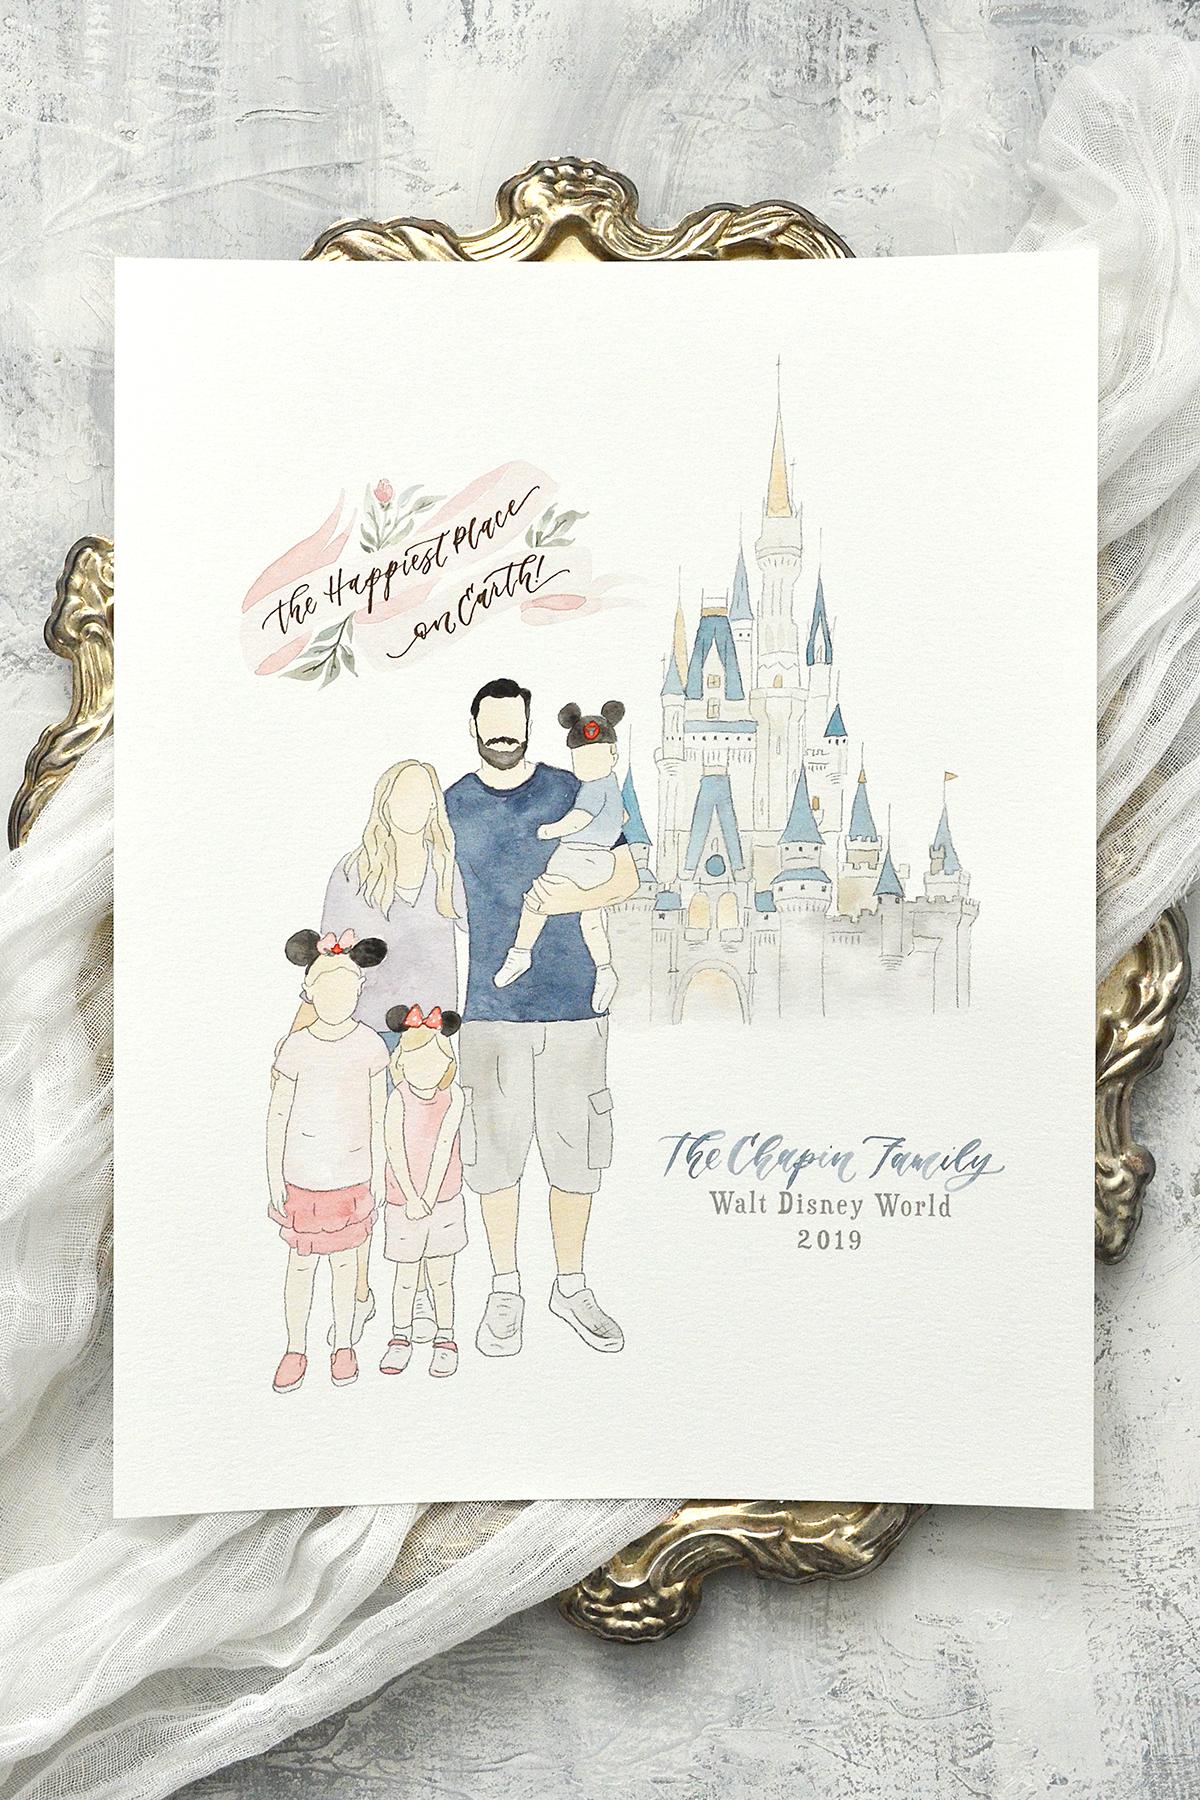 Faceless Watercolor Family Portrait at Walt Disney World, Vacation Keepsake by Sam Allen Creates – YourNewFriendSam on Etsy